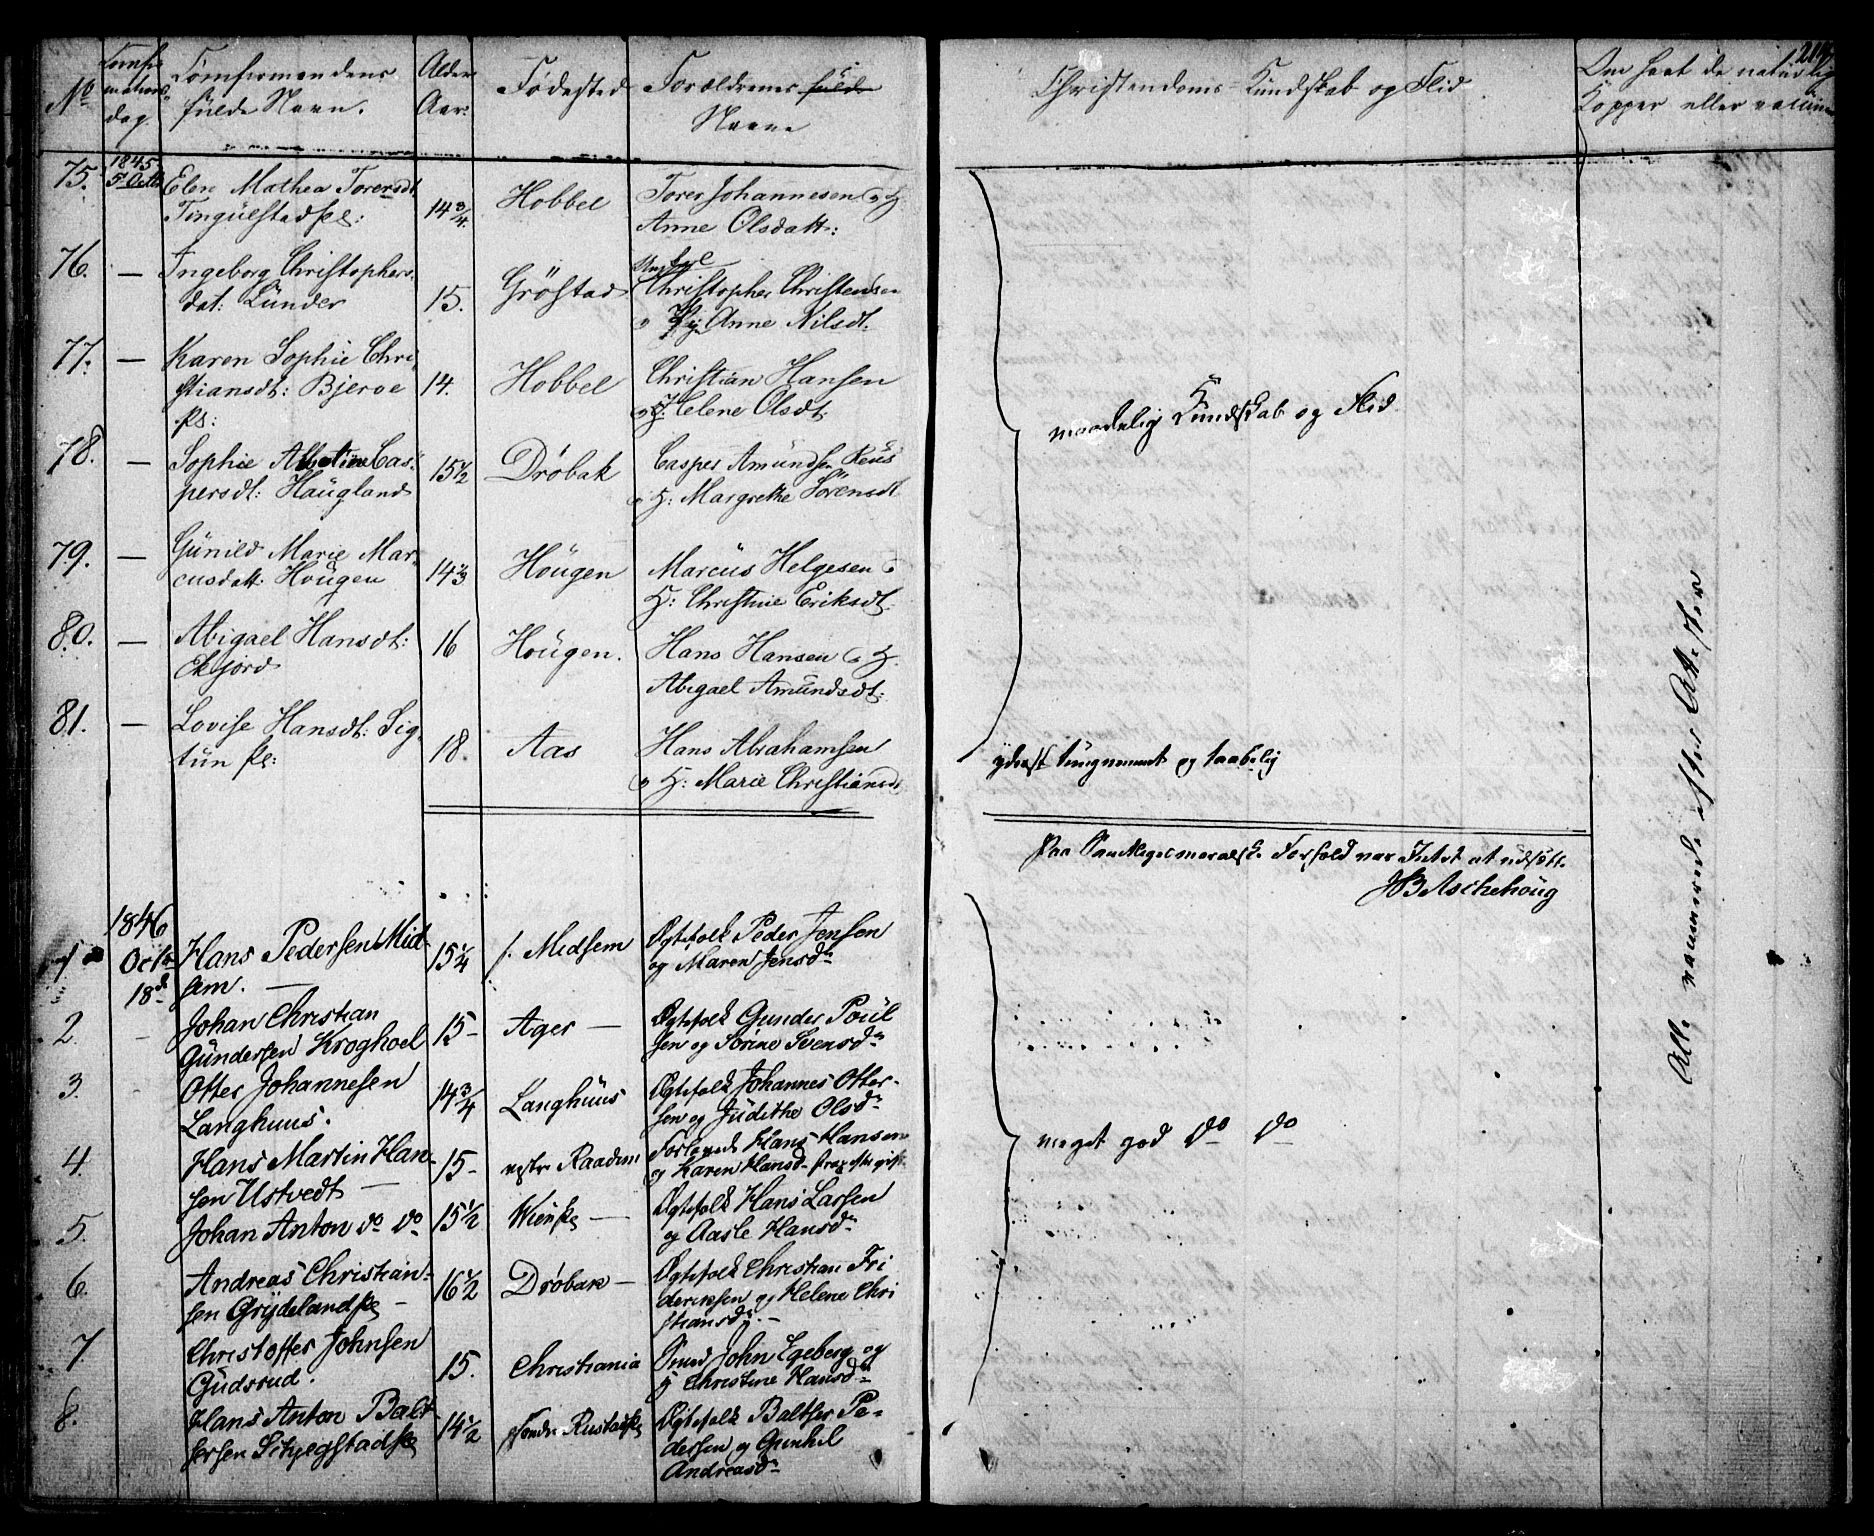 SAO, Kråkstad prestekontor Kirkebøker, F/Fa/L0005: Ministerialbok nr. I 5, 1837-1847, s. 214